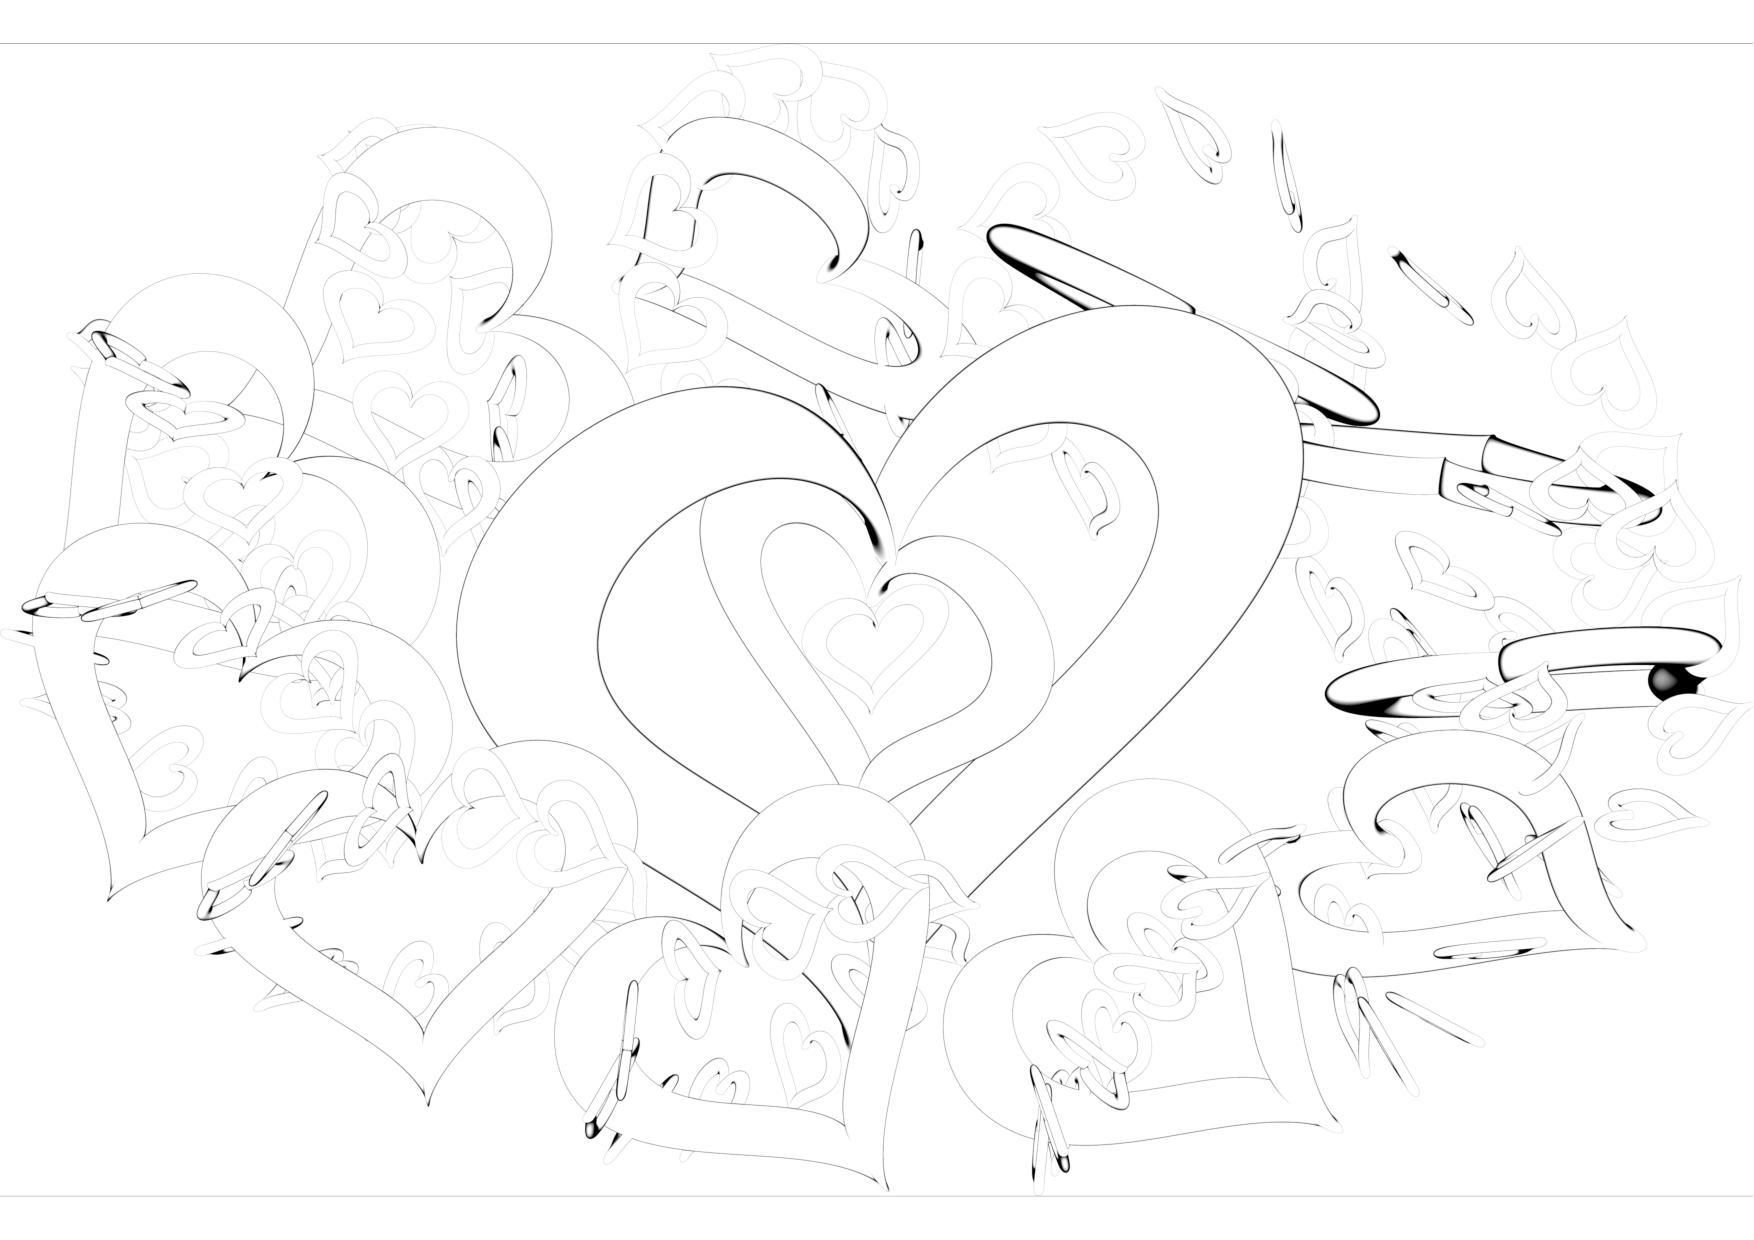 Colouring sheet - orbiting hearts